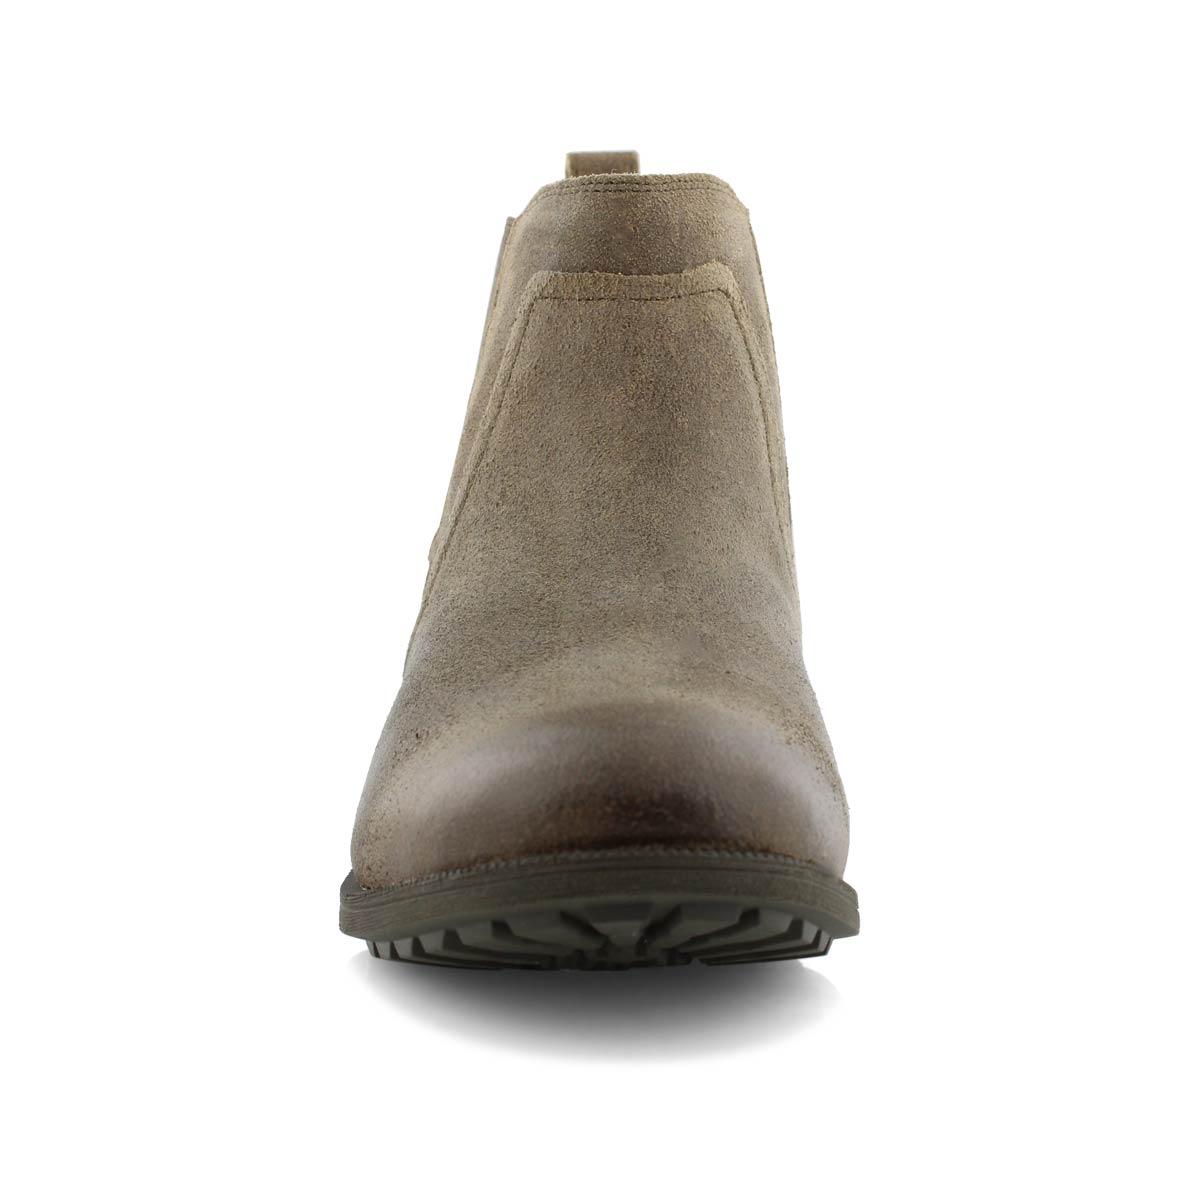 Lds Bonham II dove wtpf chelsea boot